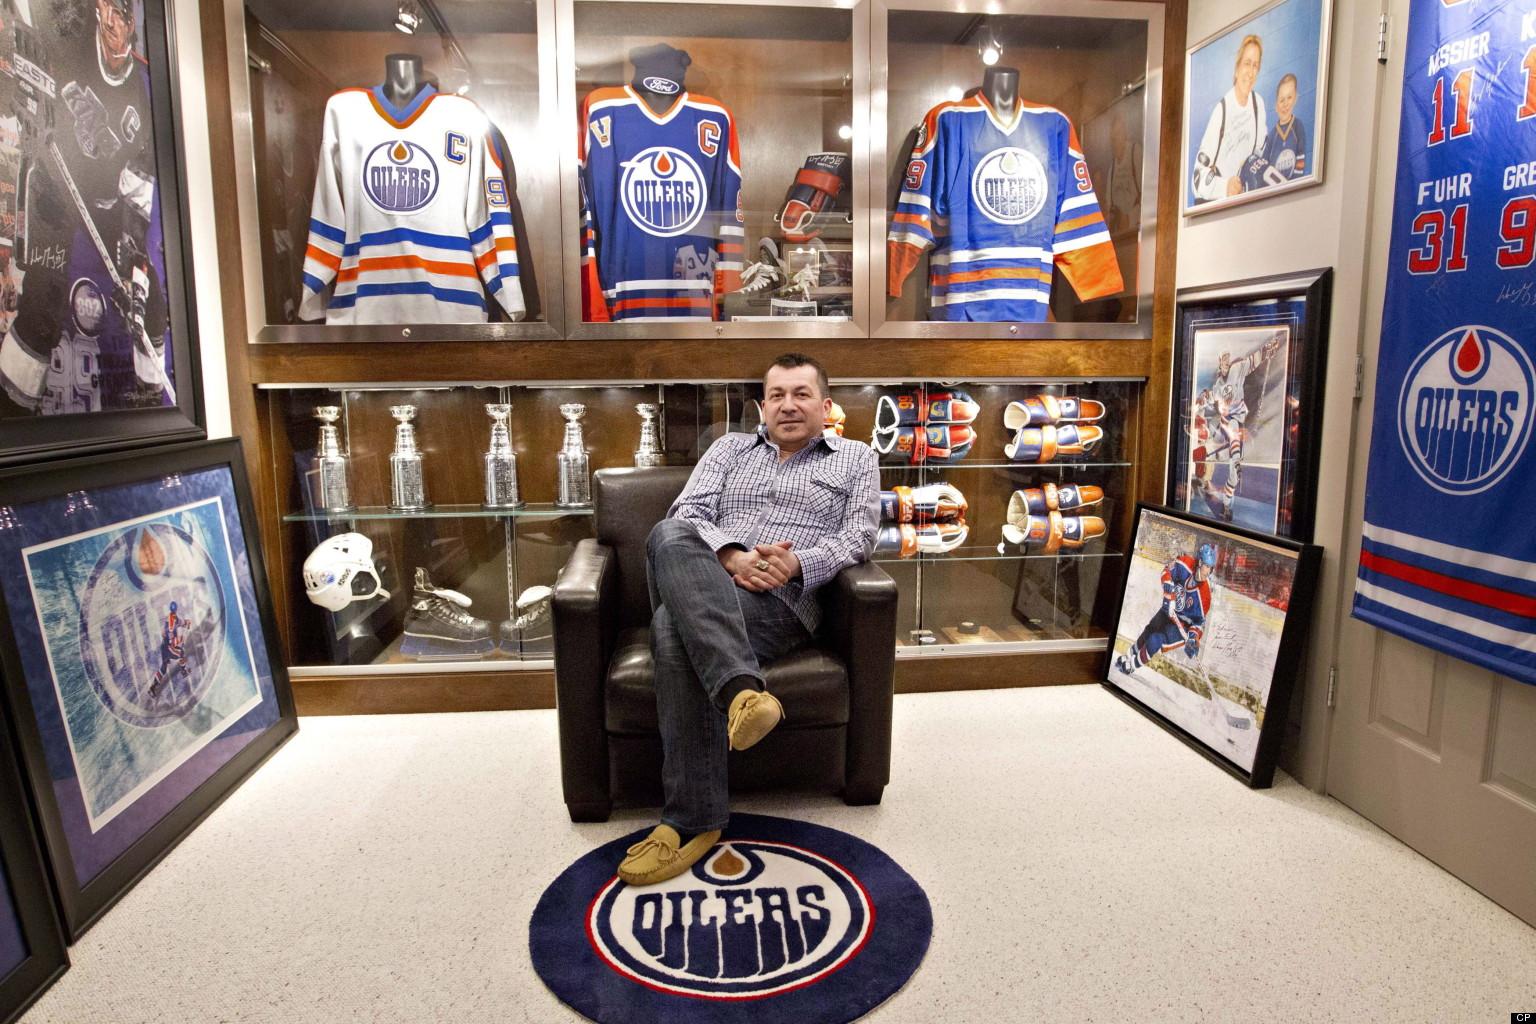 Wayne Gretzky Memorabilia Superfan Sells Massive